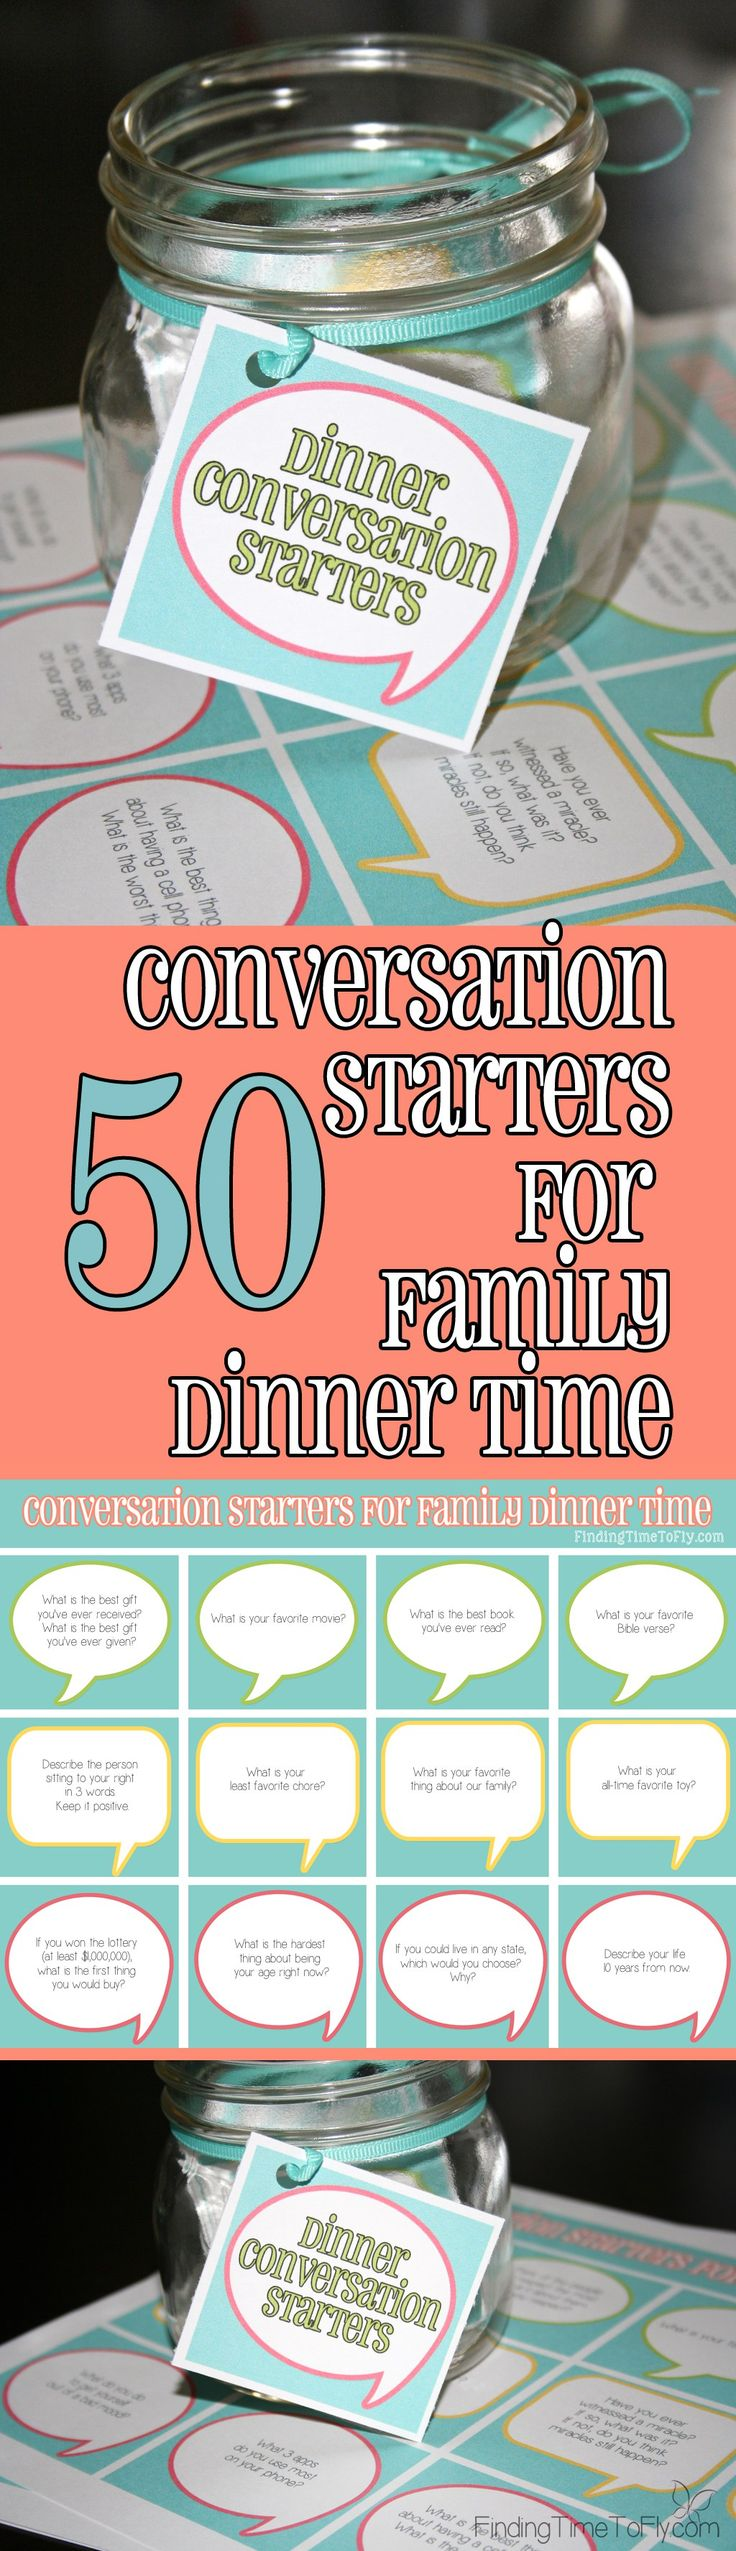 best family time images on pinterest